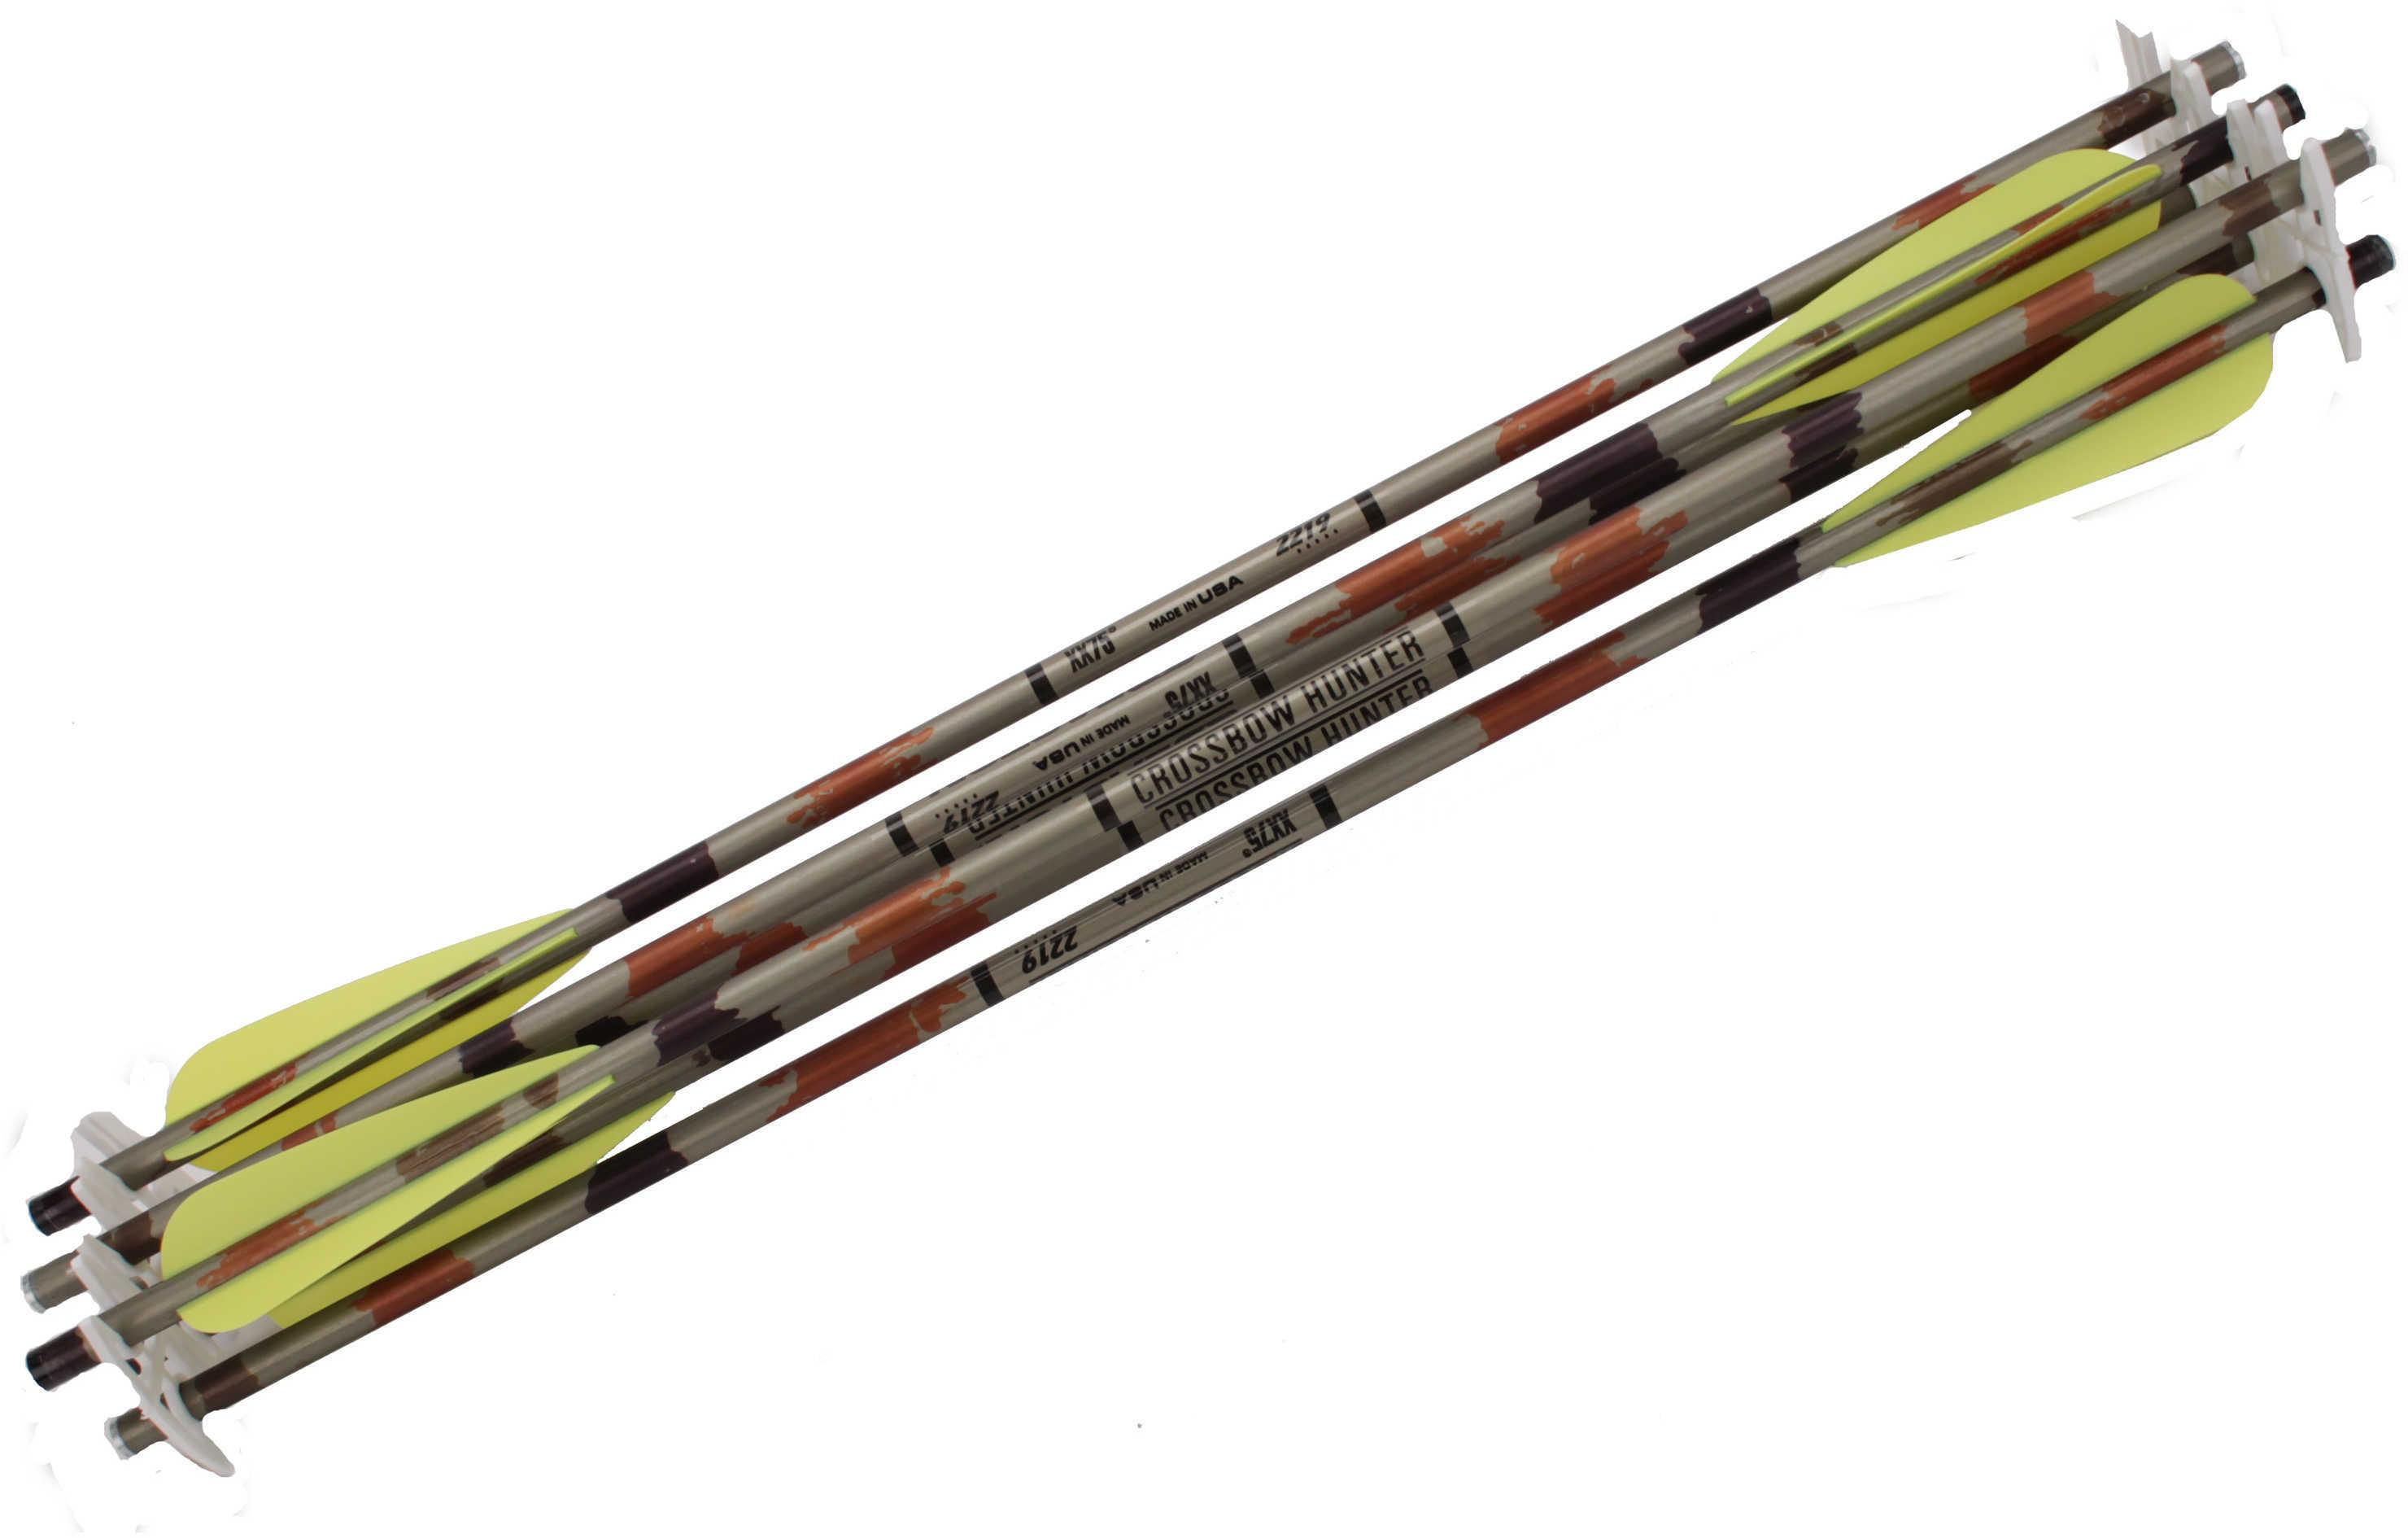 Excalibur Aluminum Bolts 2219 20 in. 4 in. Vanes 6 pk. Model: 2219-V20-6